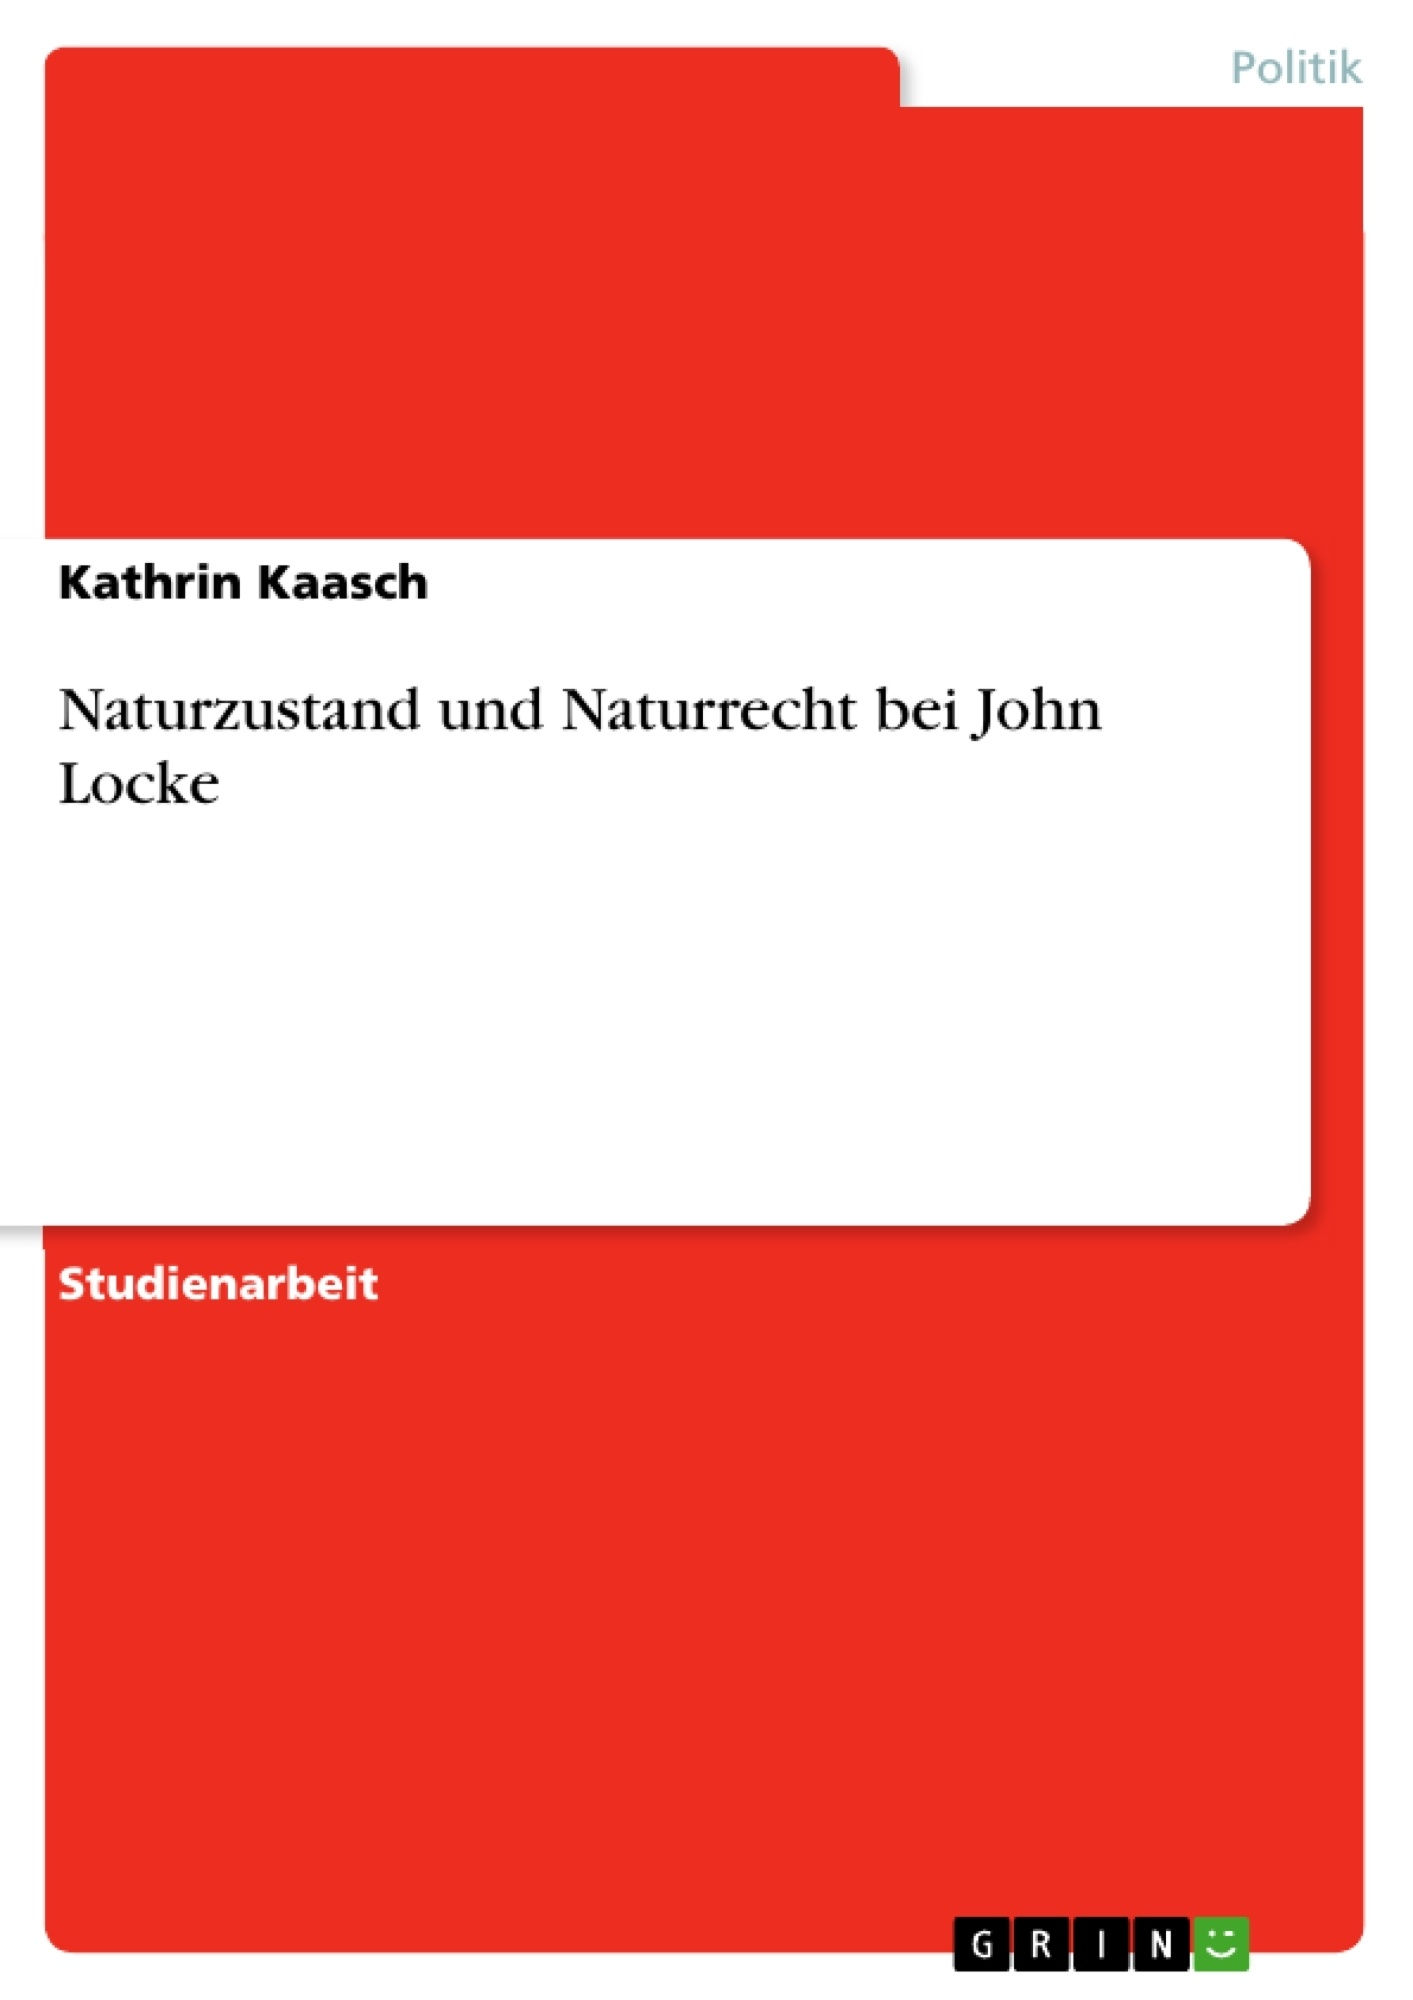 Titel: Naturzustand und Naturrecht bei John Locke